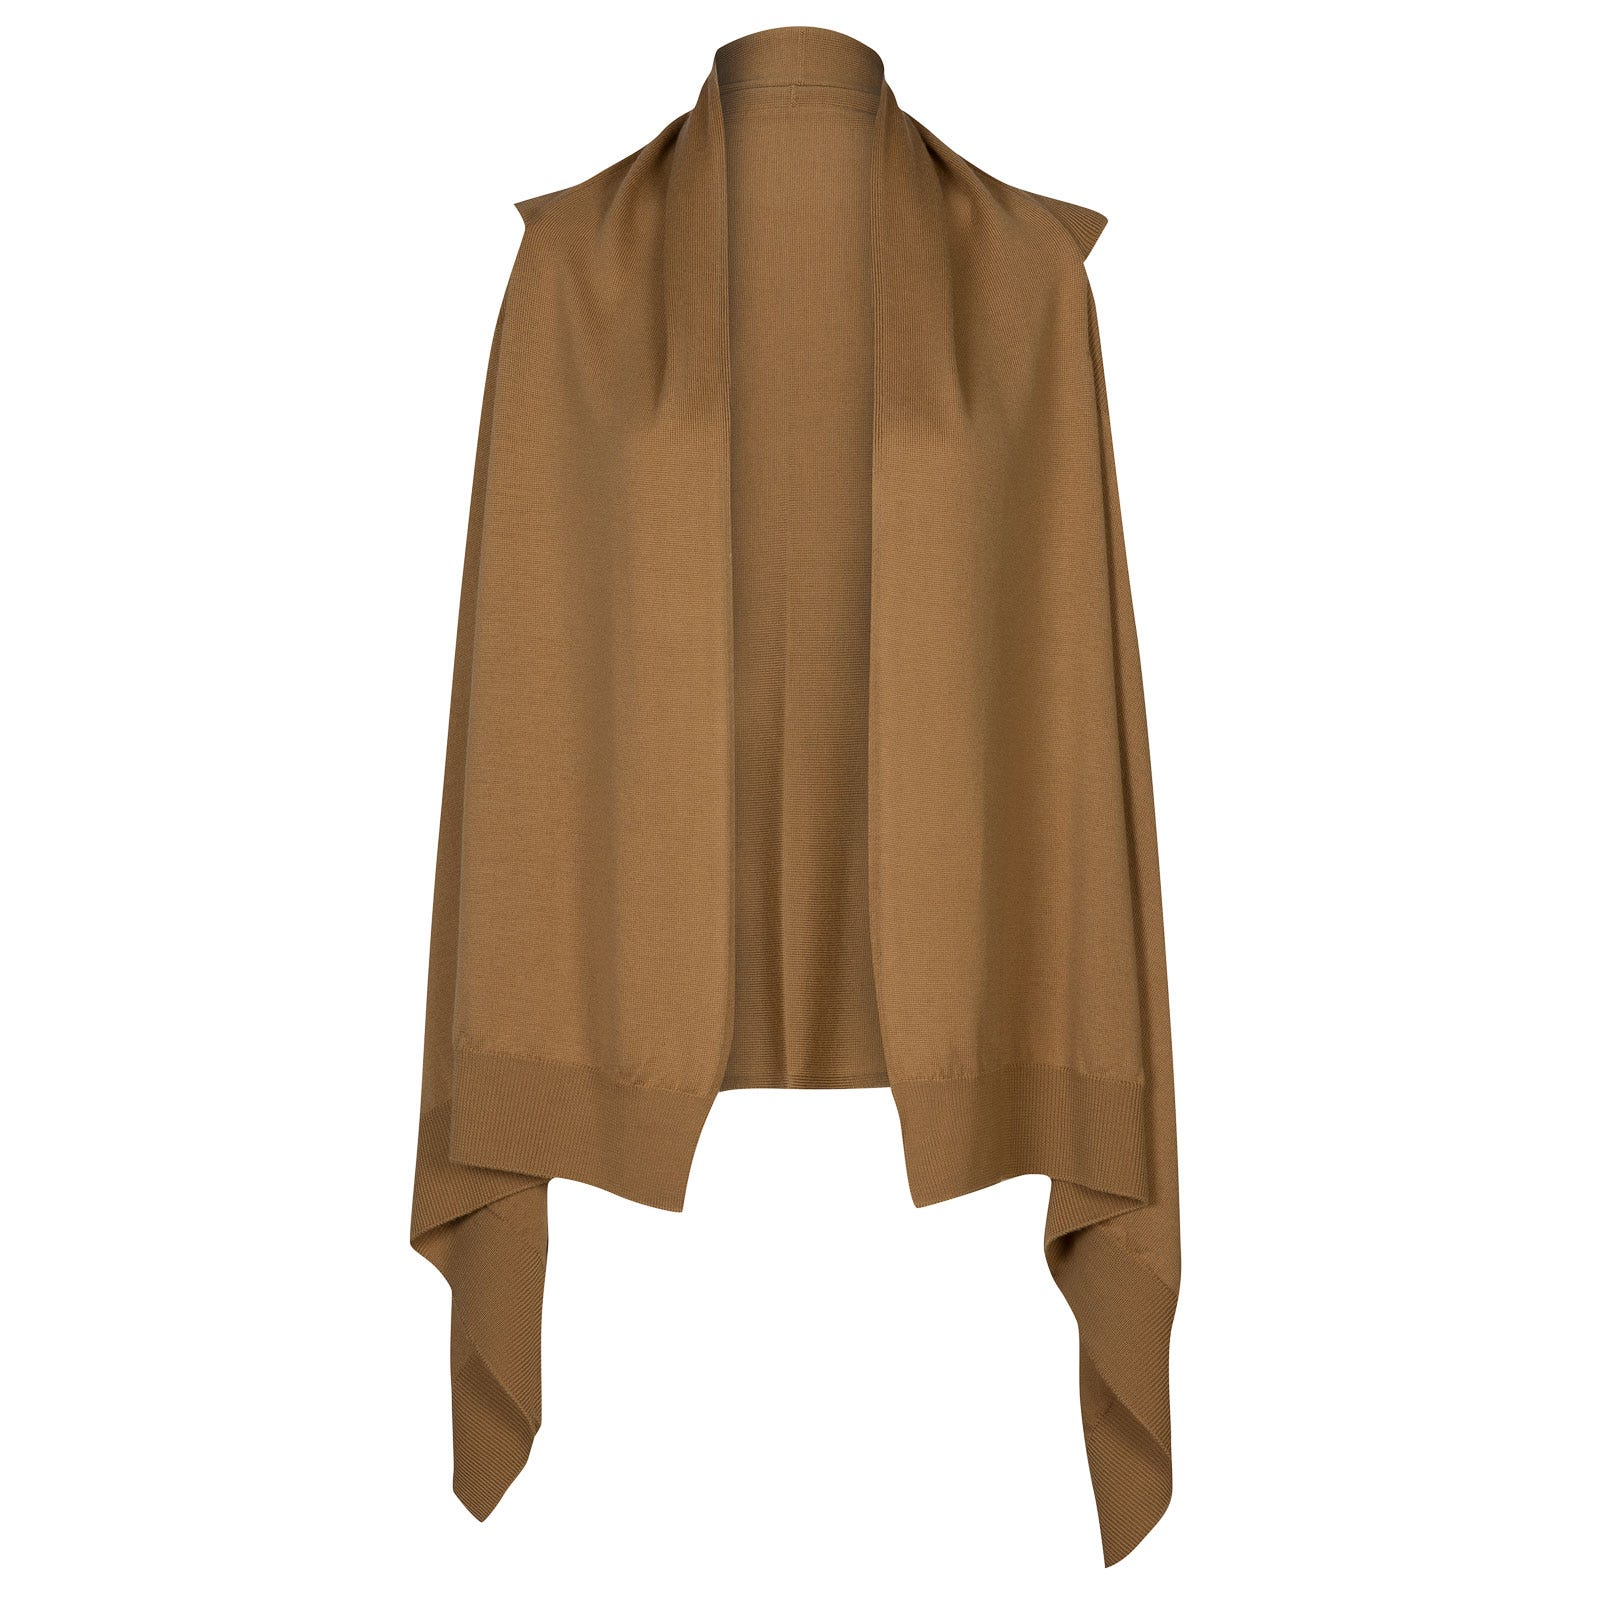 John Smedley Talla Merino Wool Cardigan in Camel-S